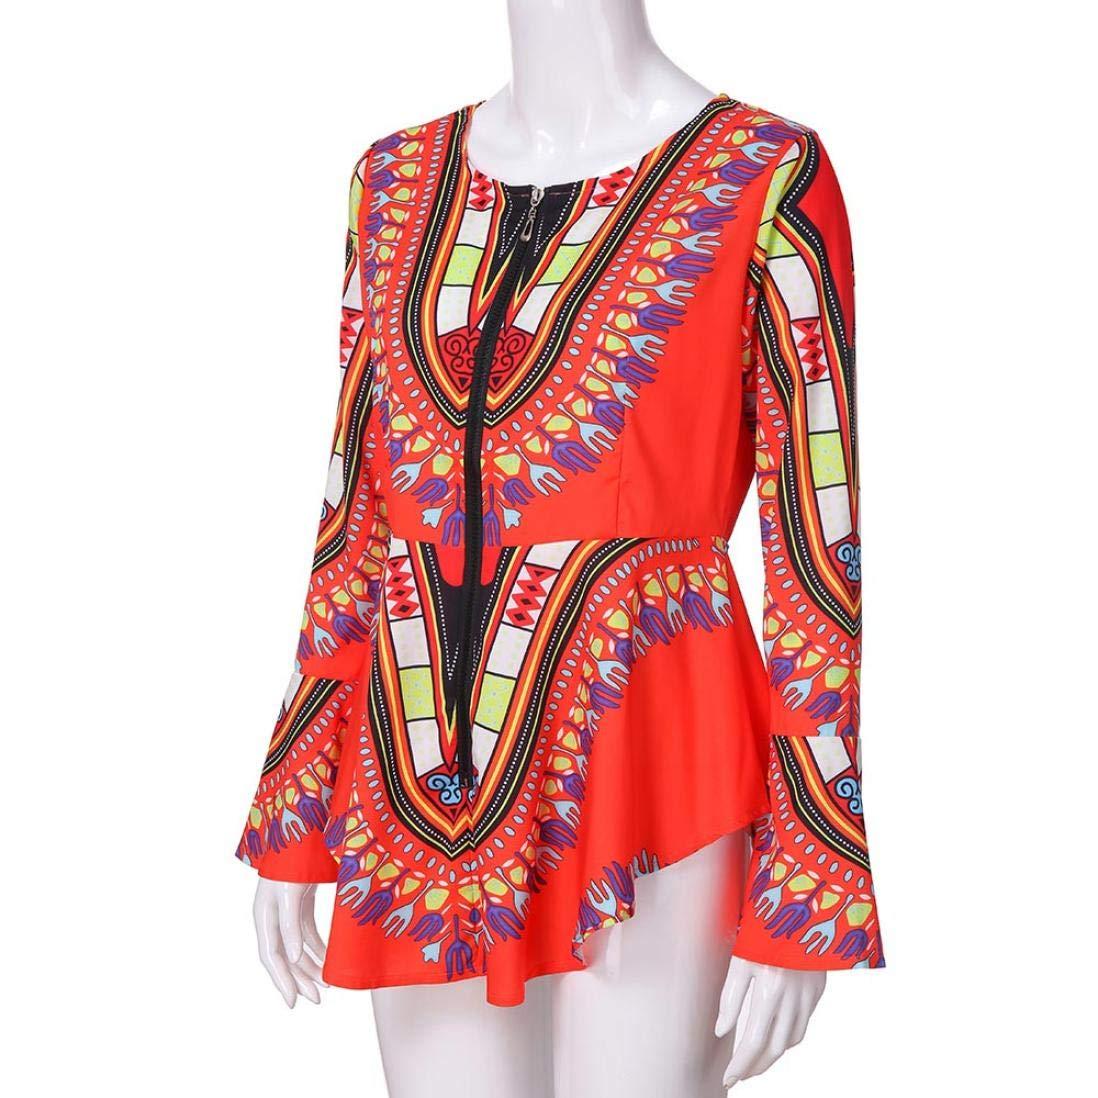 Amazon.com : Clearance Women Tops LuluZanm Printed Zipper Closure Blouse Asymmetric Hem Long Sleeve Tops (Orange, S) : Grocery & Gourmet Food